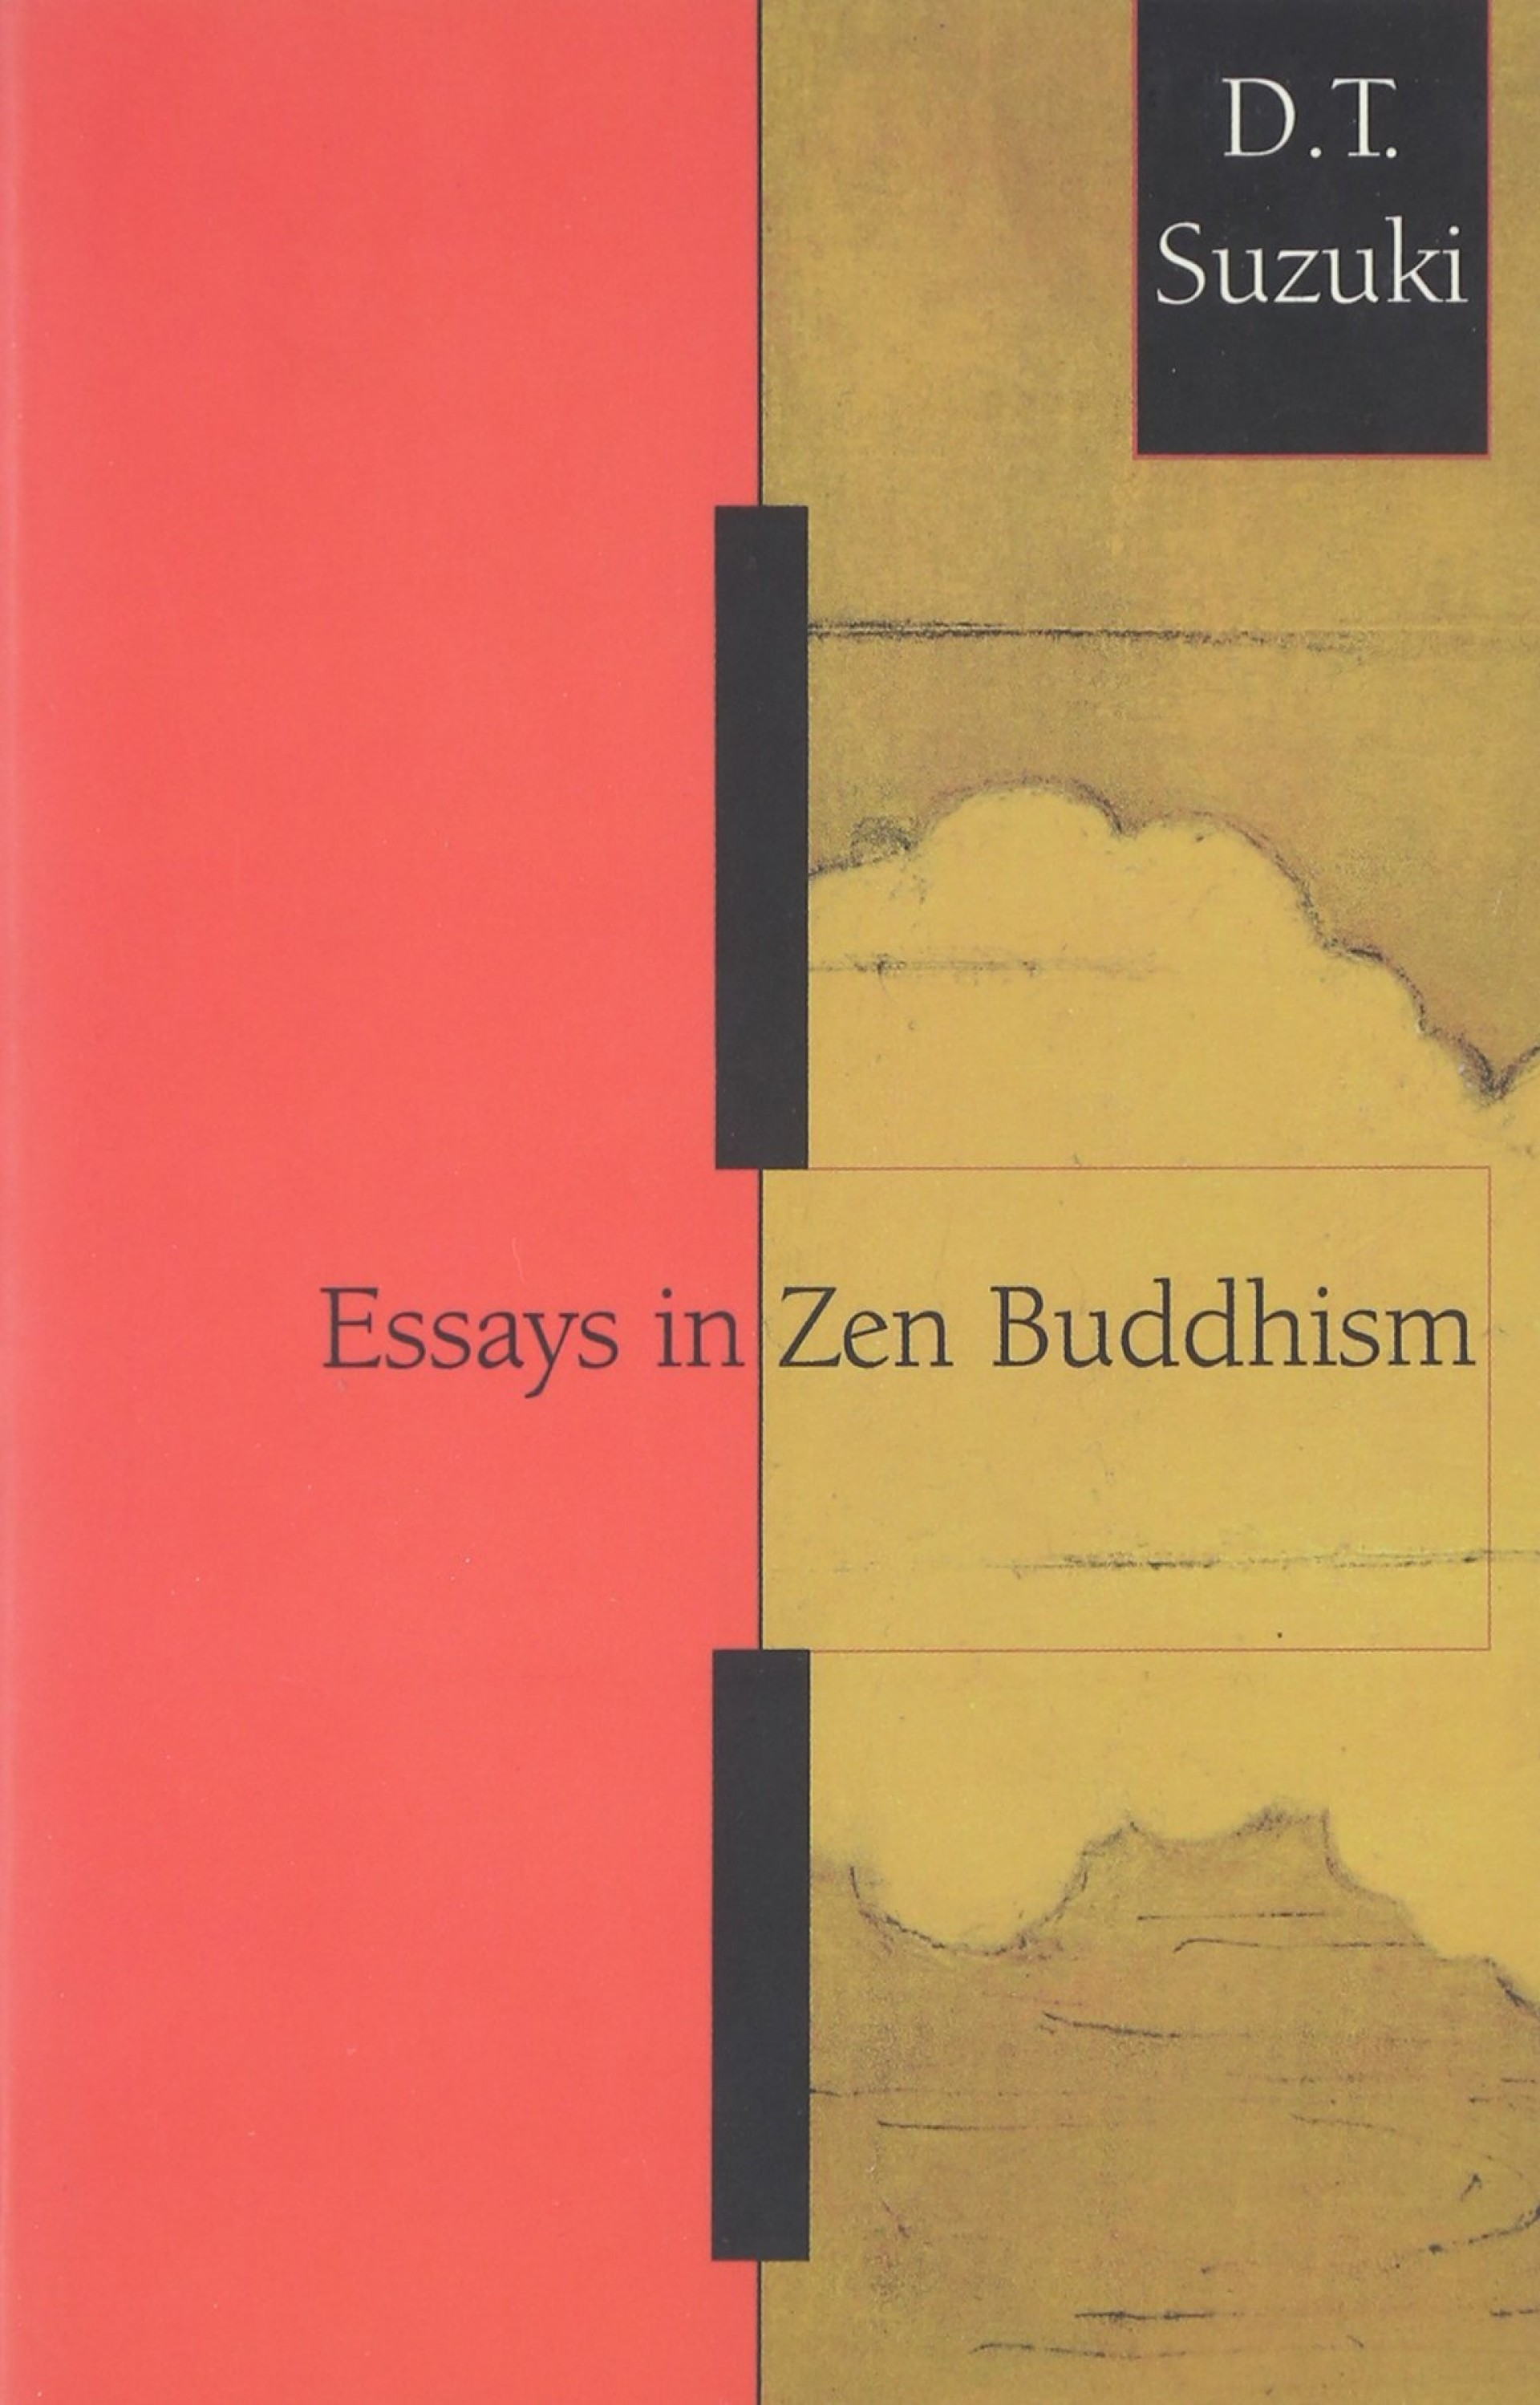 003 71cccelhvrl Essay Example Essays First Stunning Series Emerson Pdf Shelburne Publisher 1920